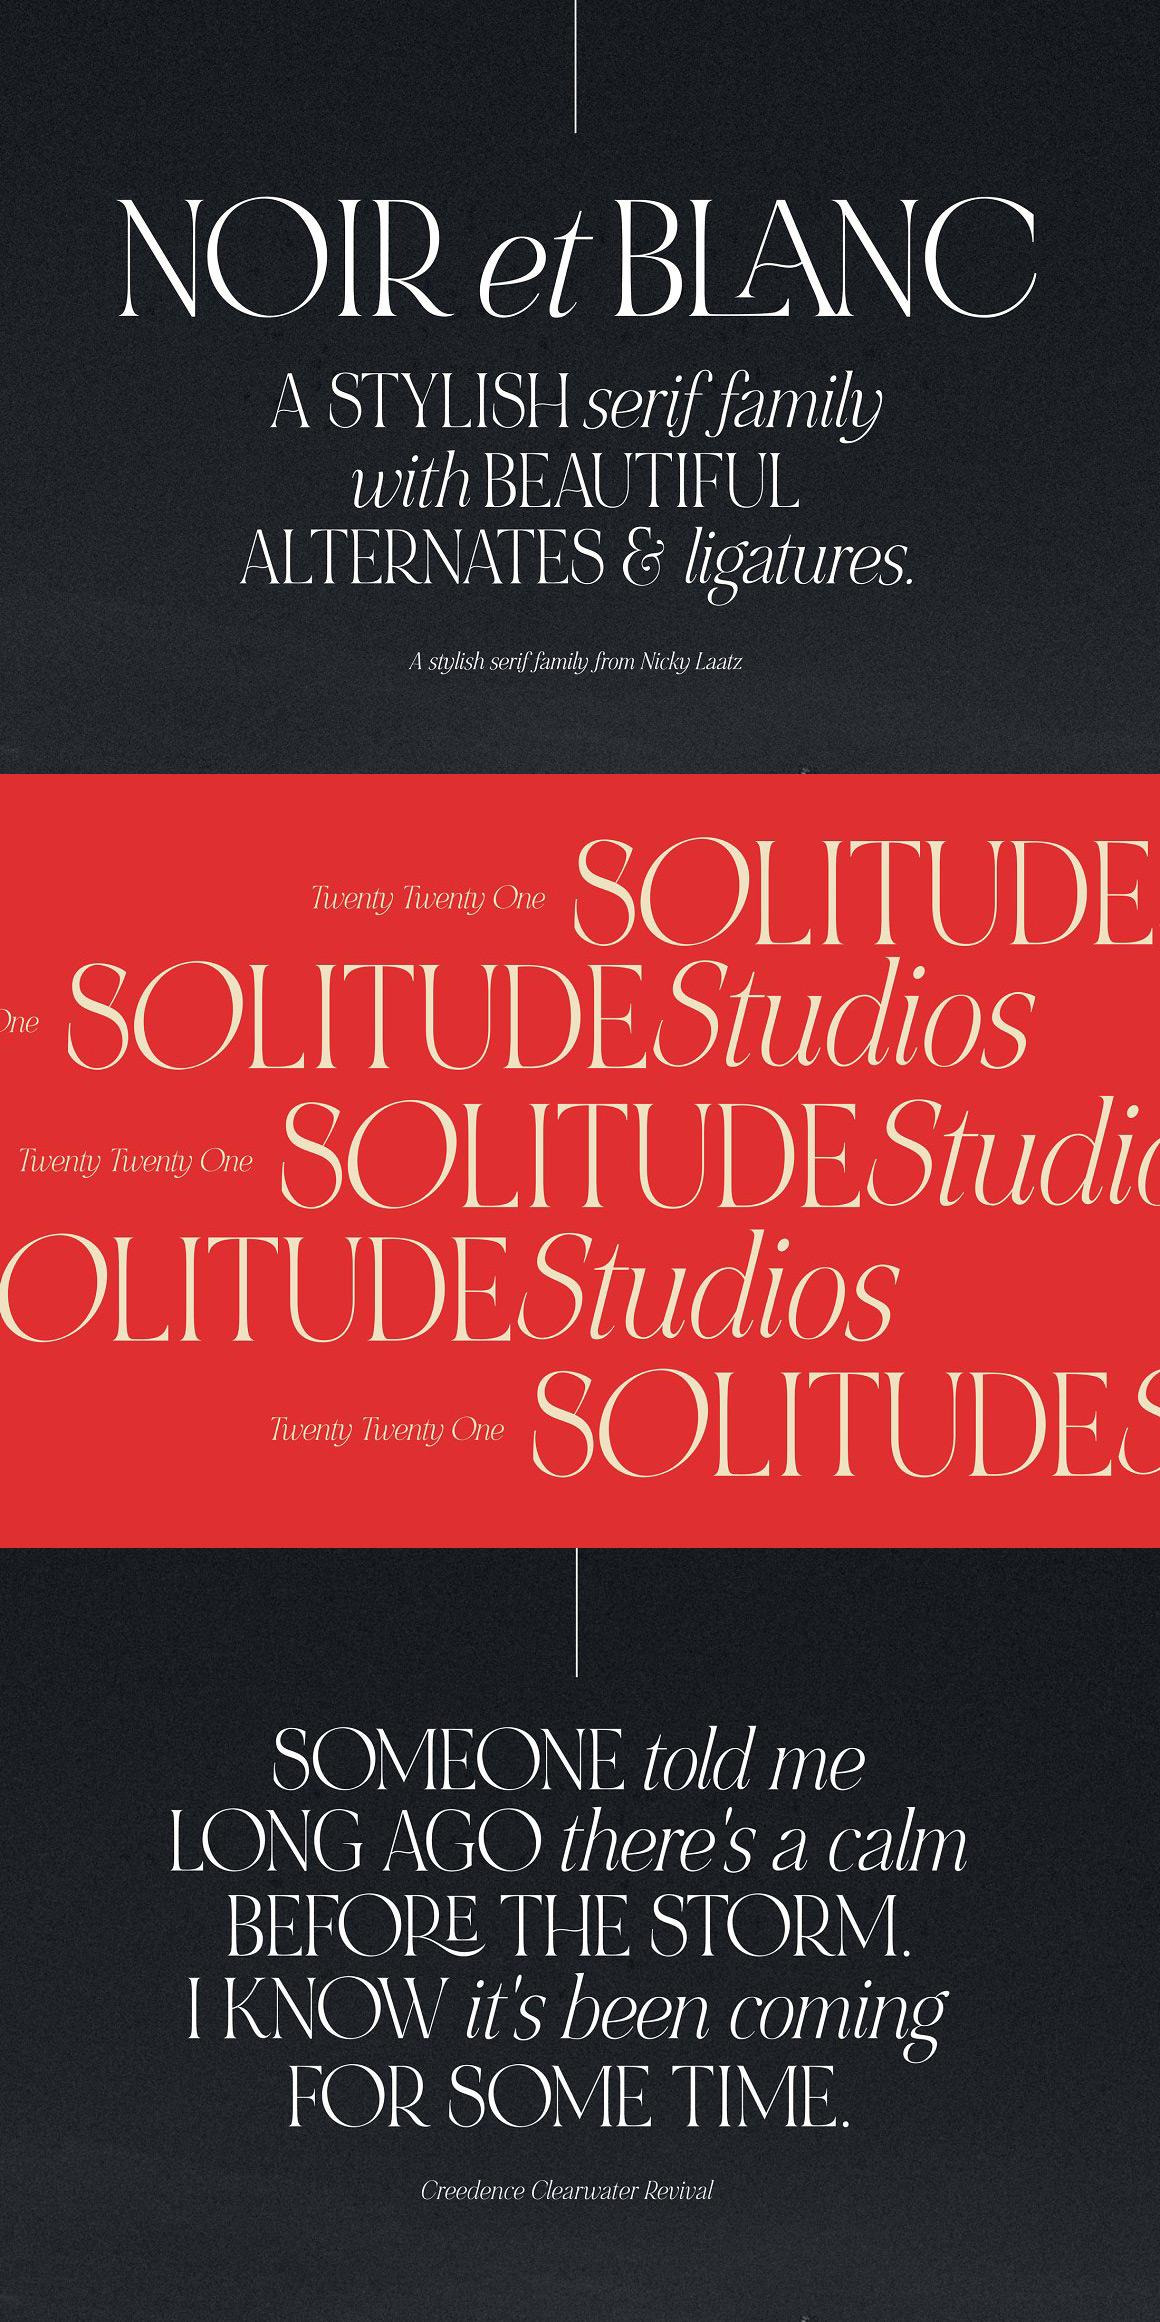 NOIR et BLANC Font Family by Nicky Laatz